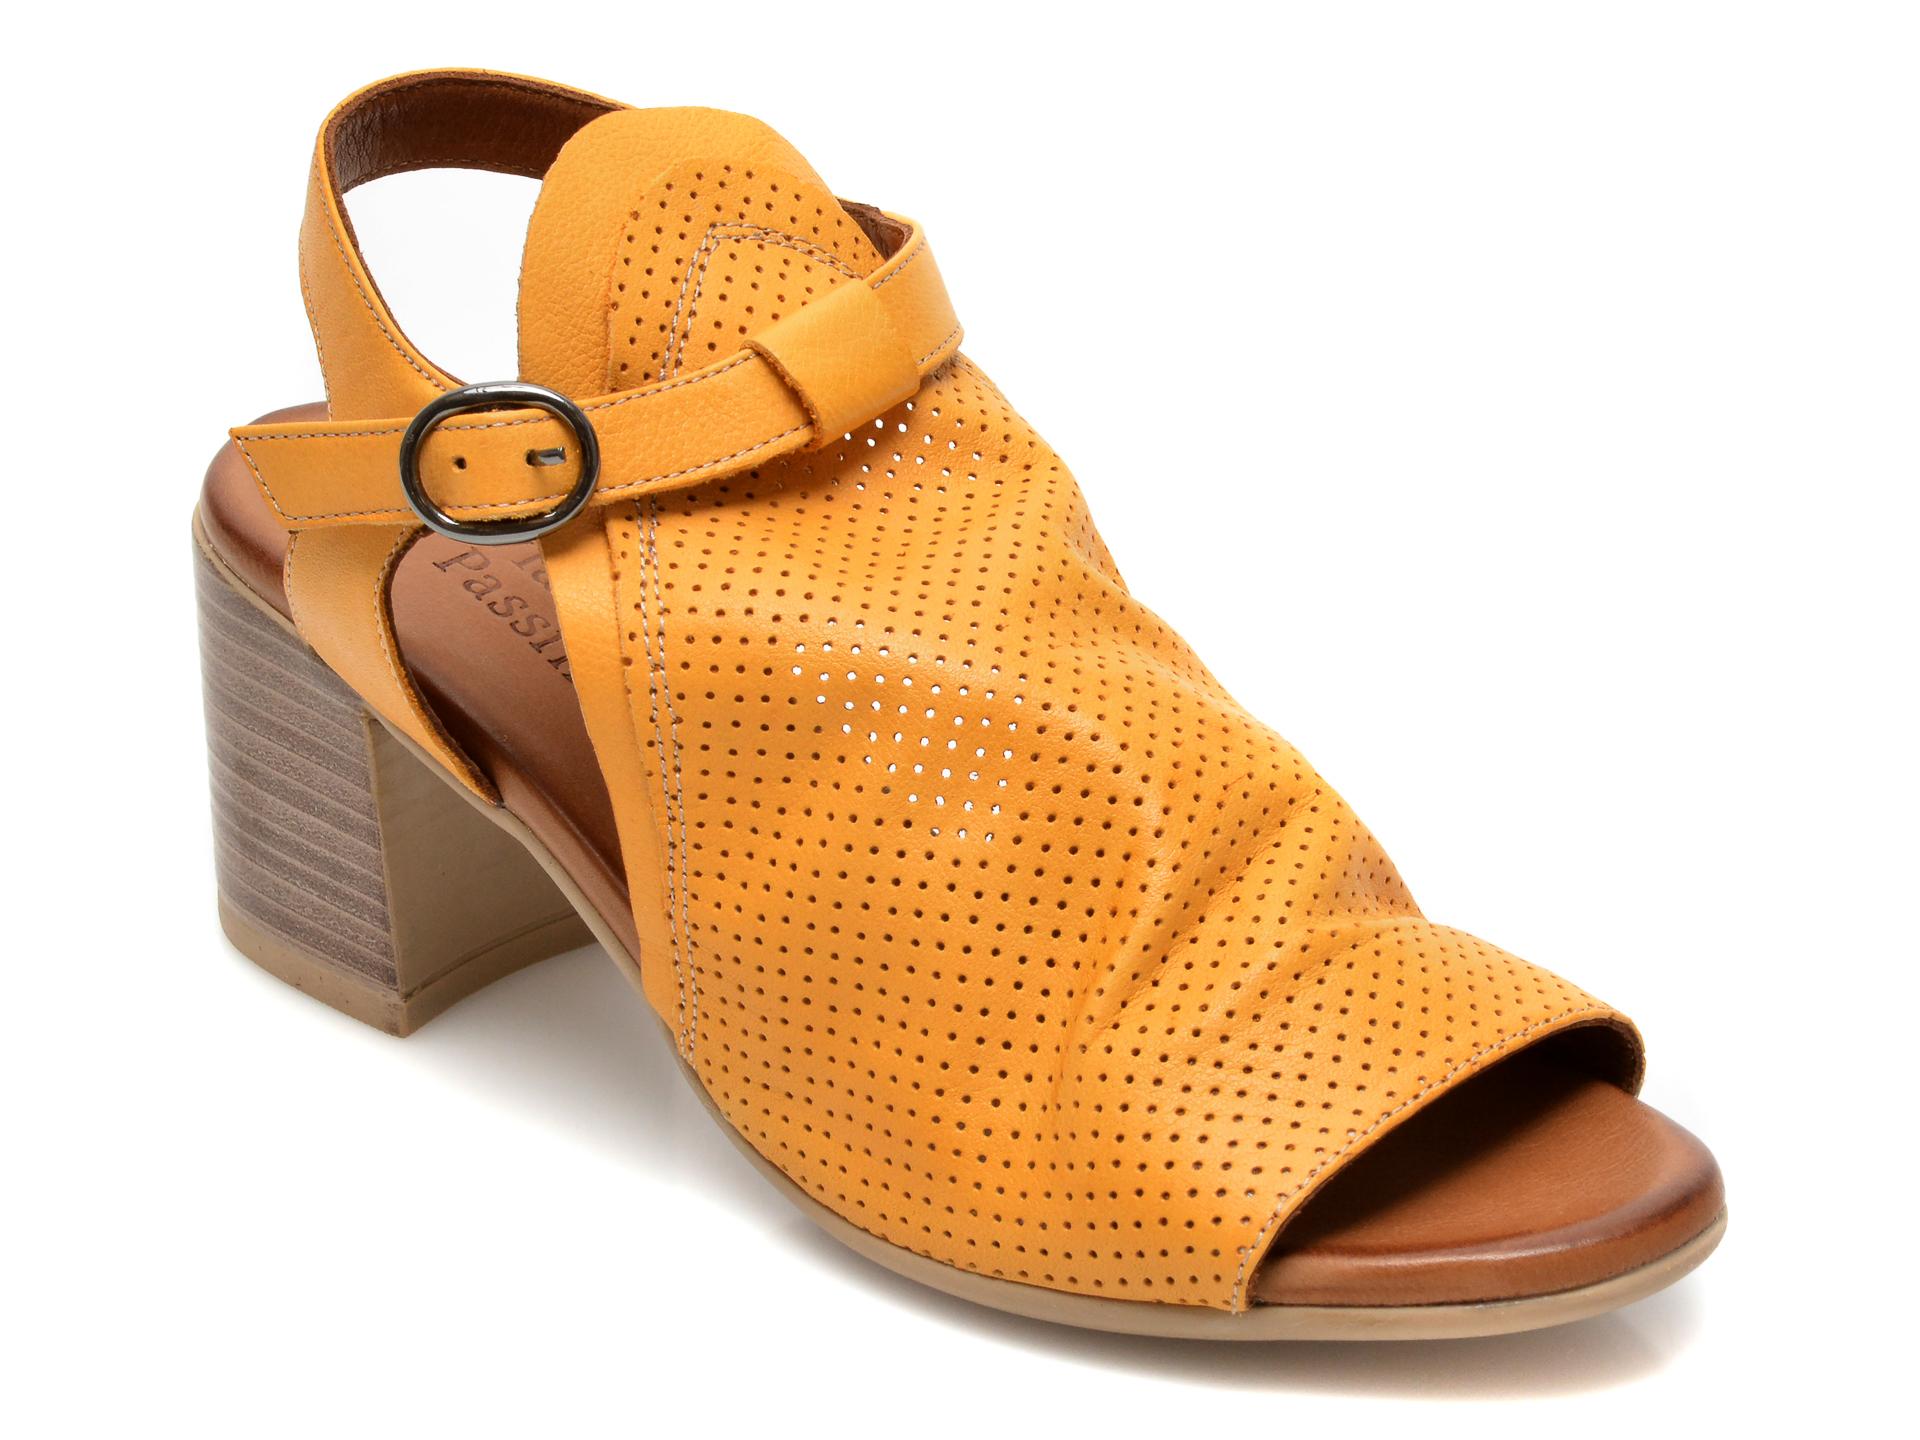 Sandale FLAVIA PASSINI galbene, 1700, din piele naturala imagine otter.ro 2021